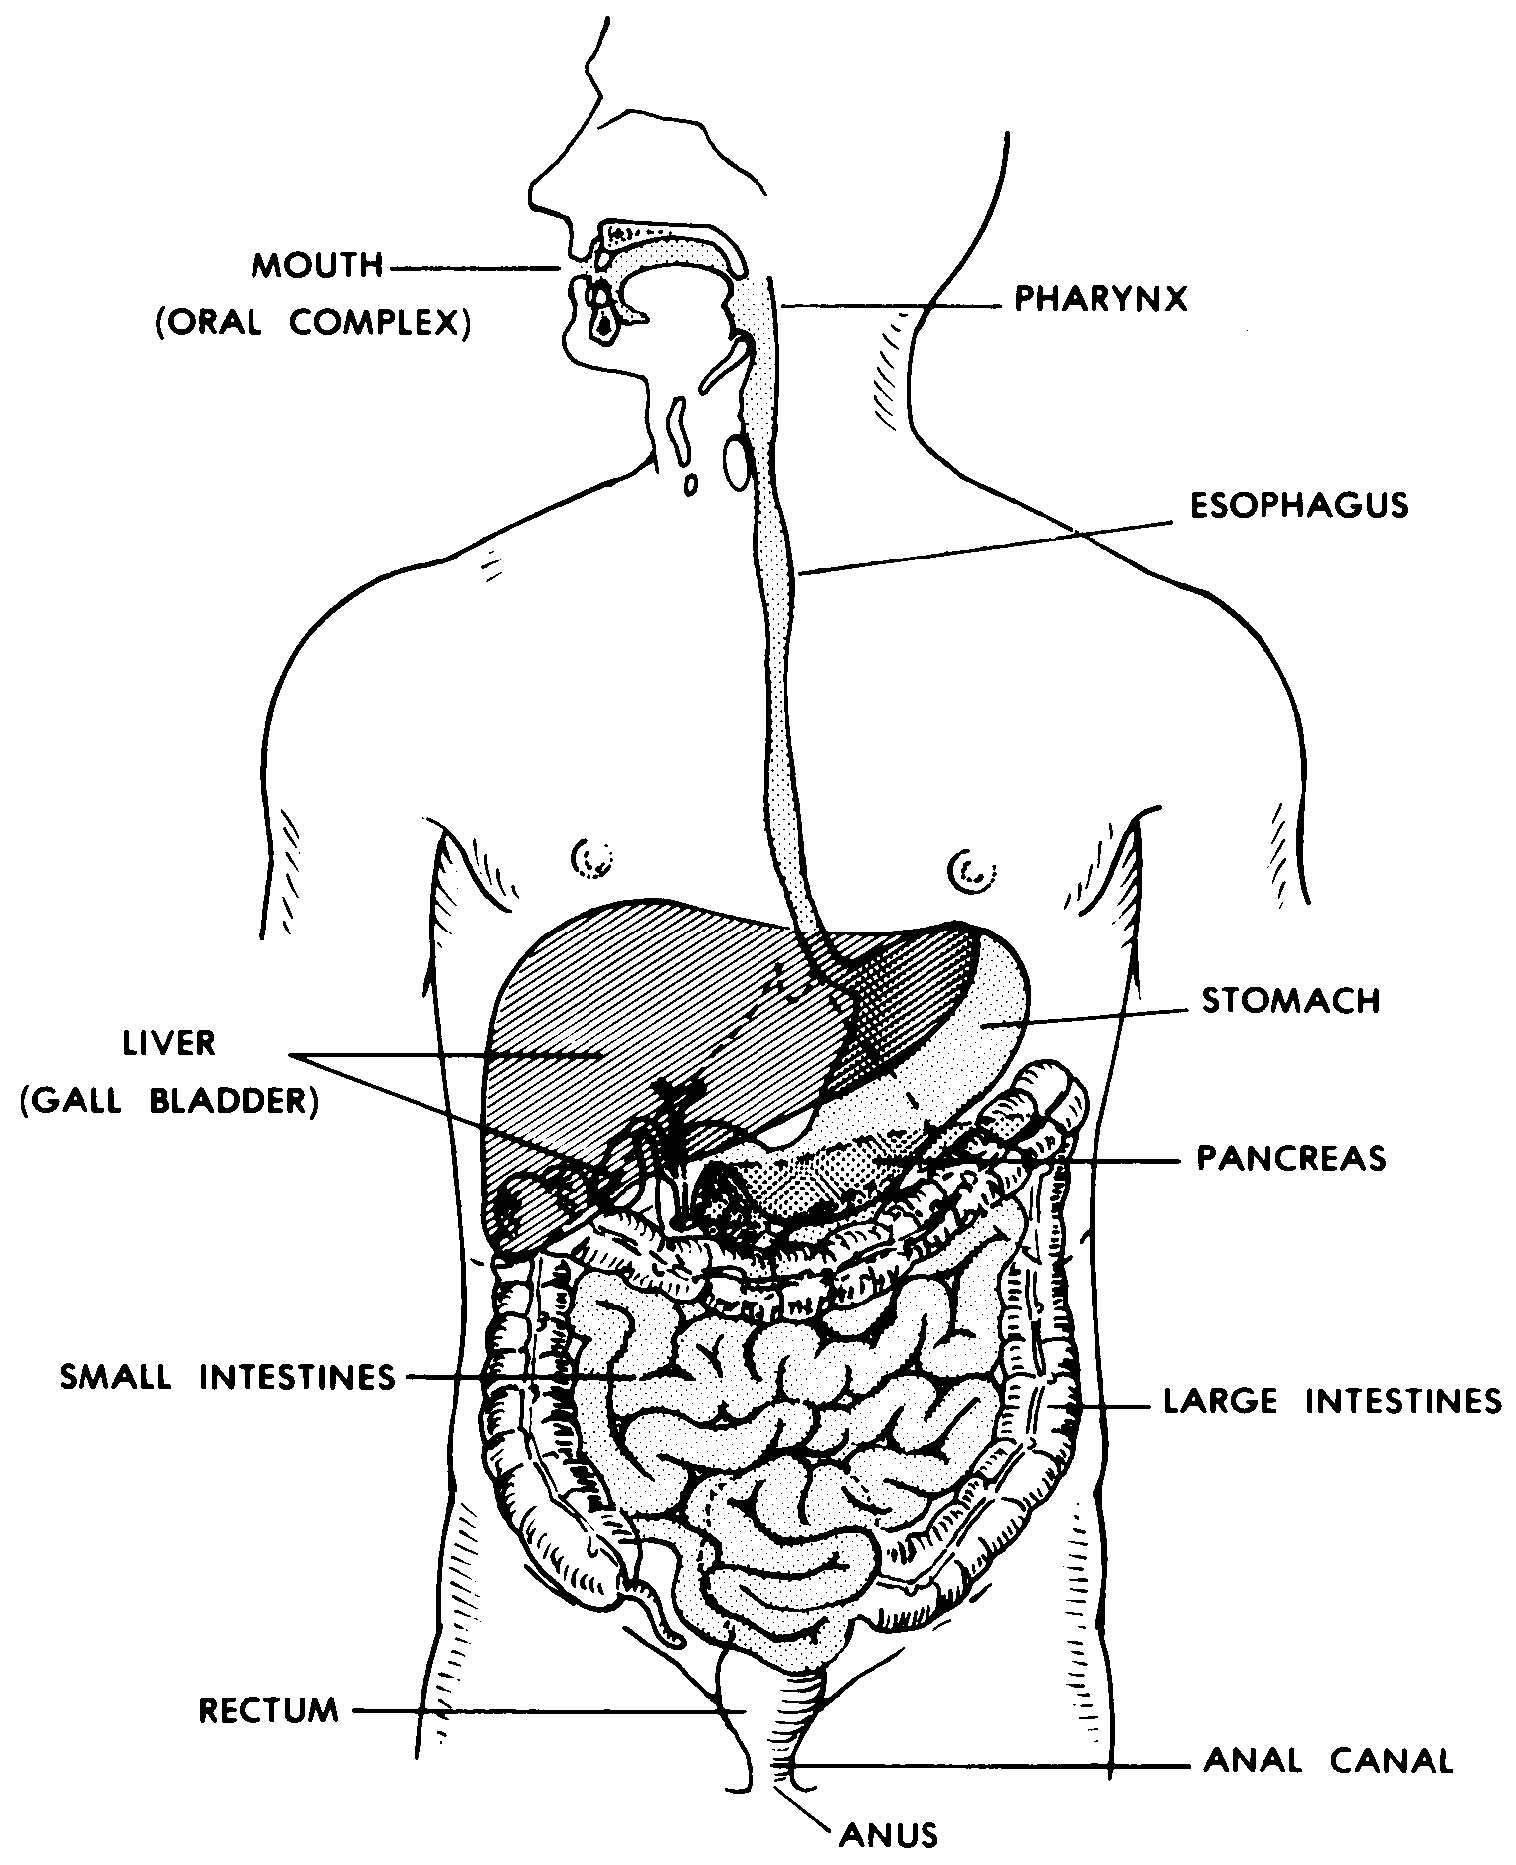 Digestive System Diagram Worksheet Amusing Worksheet Human Digestive System On Images 06 Digestive